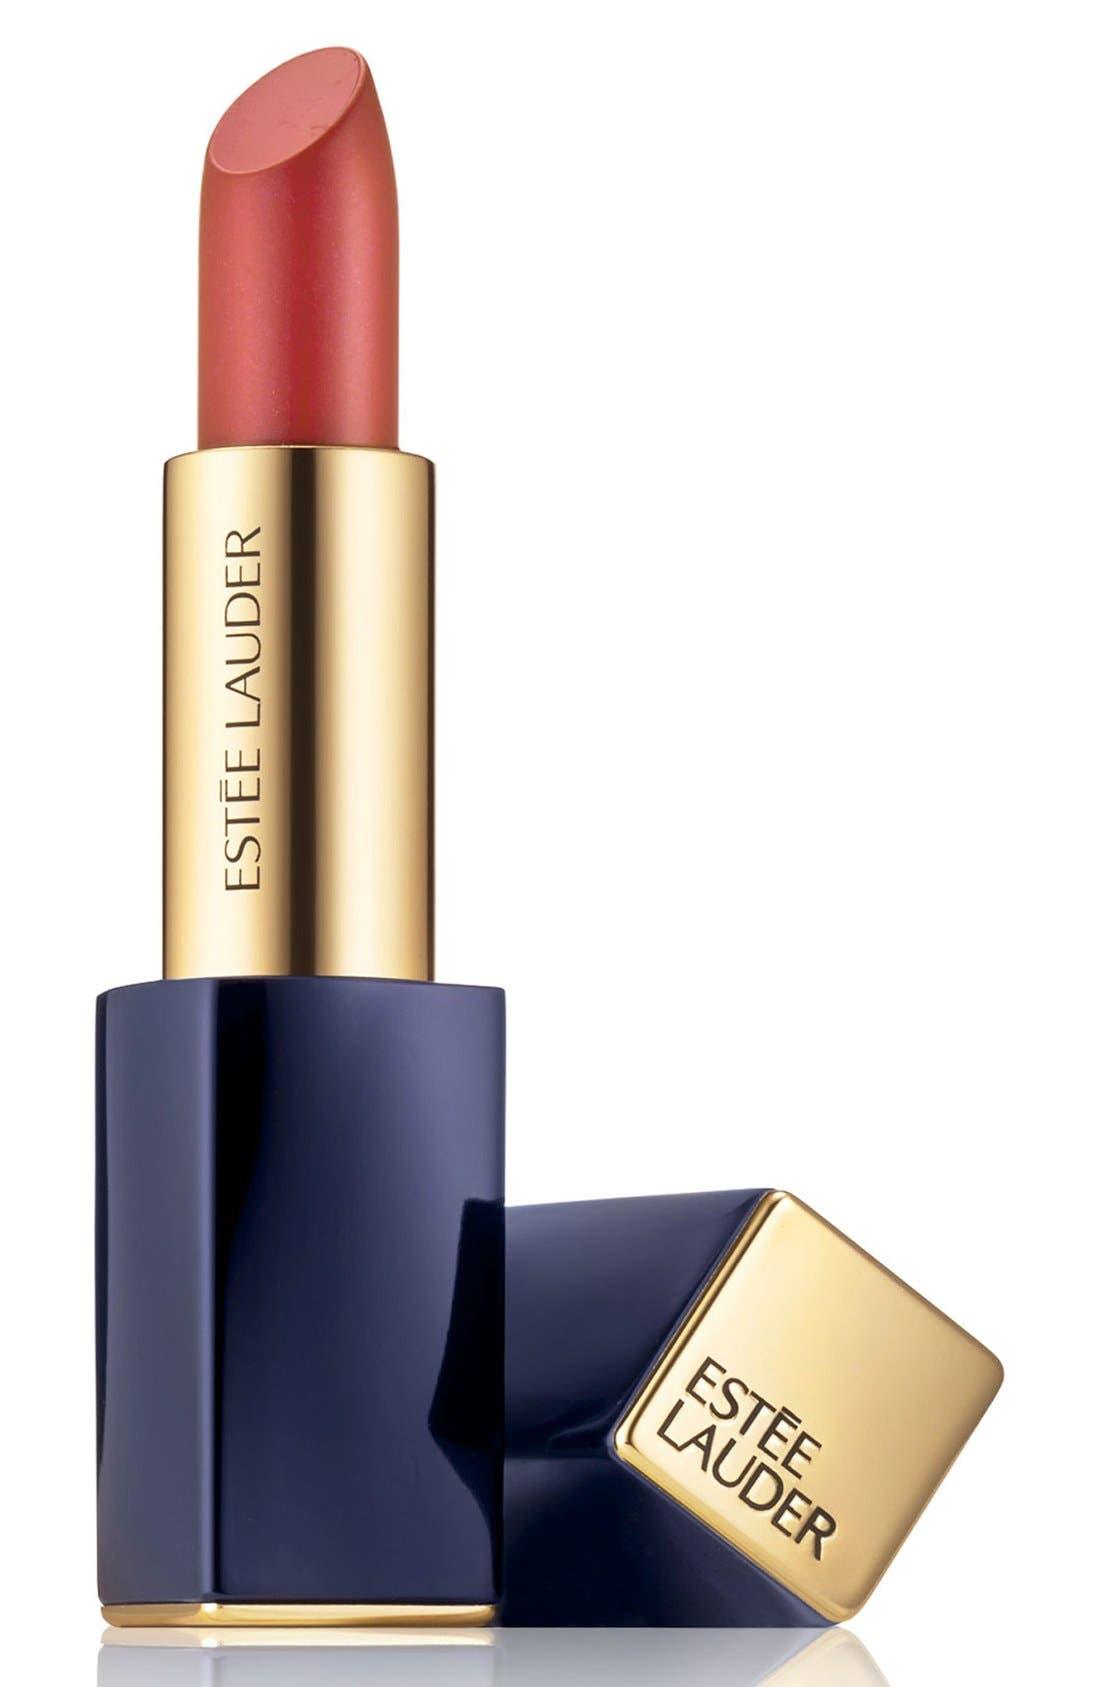 Pure Color Envy Hi-Lustre Light Sculpting Lipstick,                         Main,                         color, NUDE REVEAL